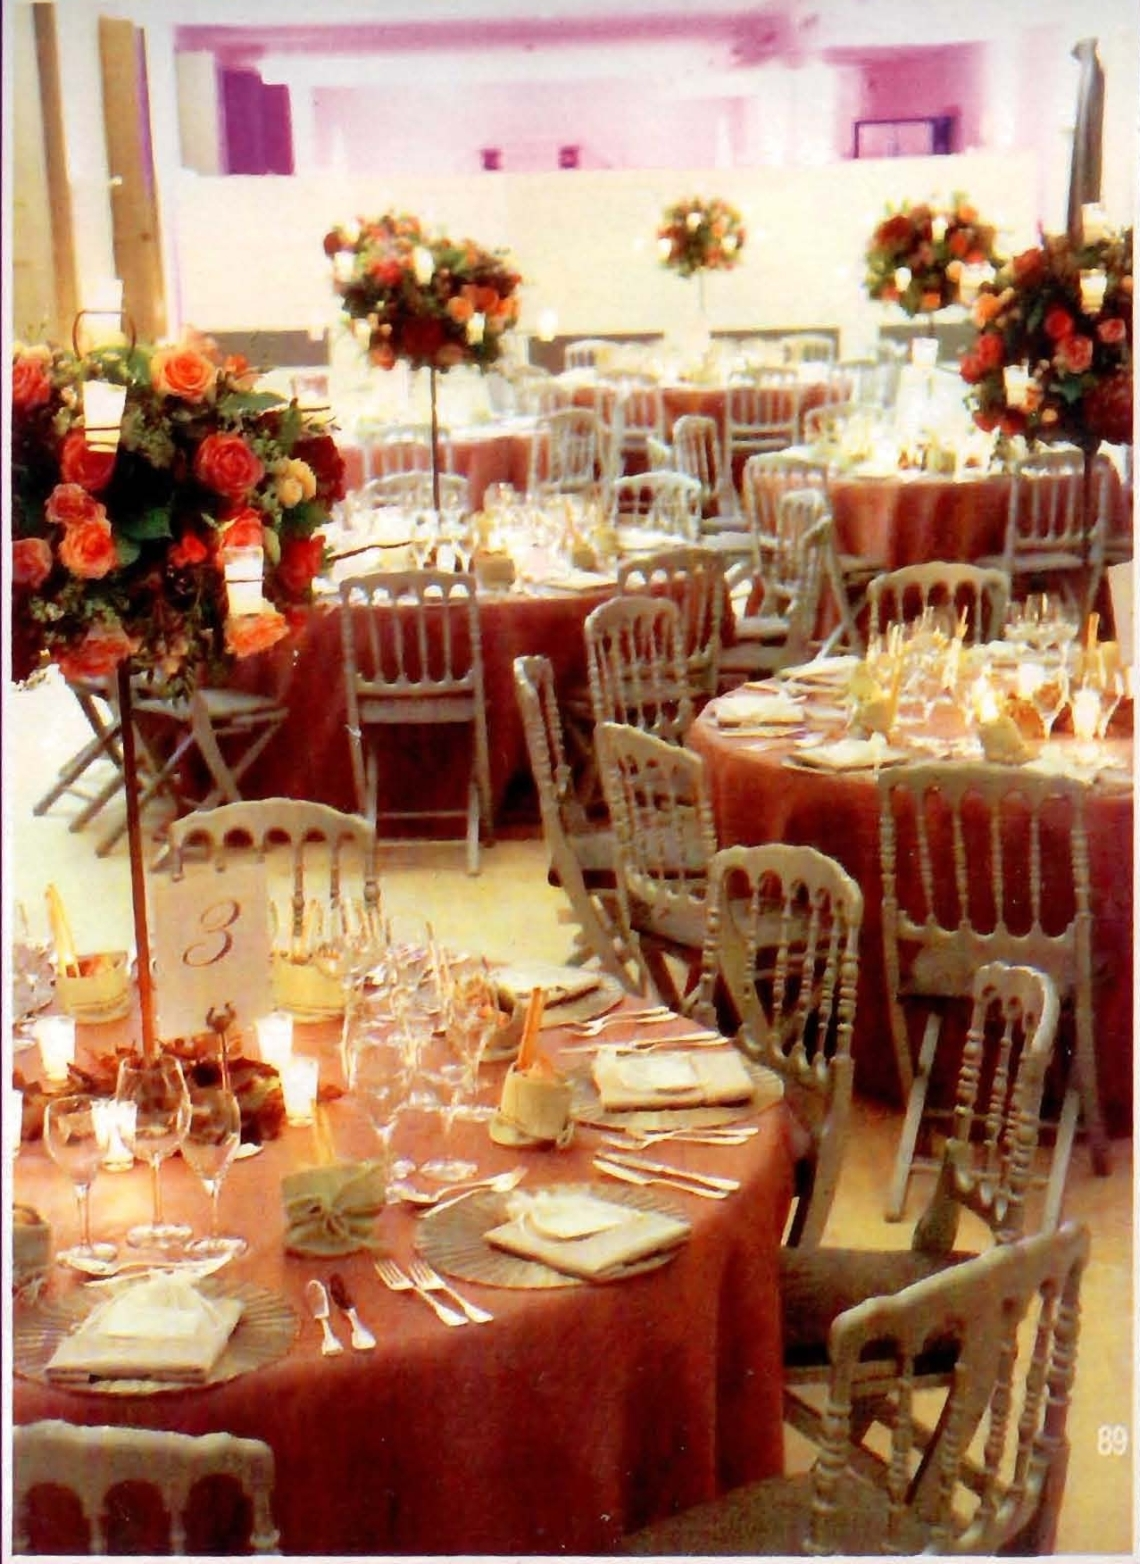 Mesas con sillas grises de palillería, manteles rosas y centros de mesas altos de rosas con velitas